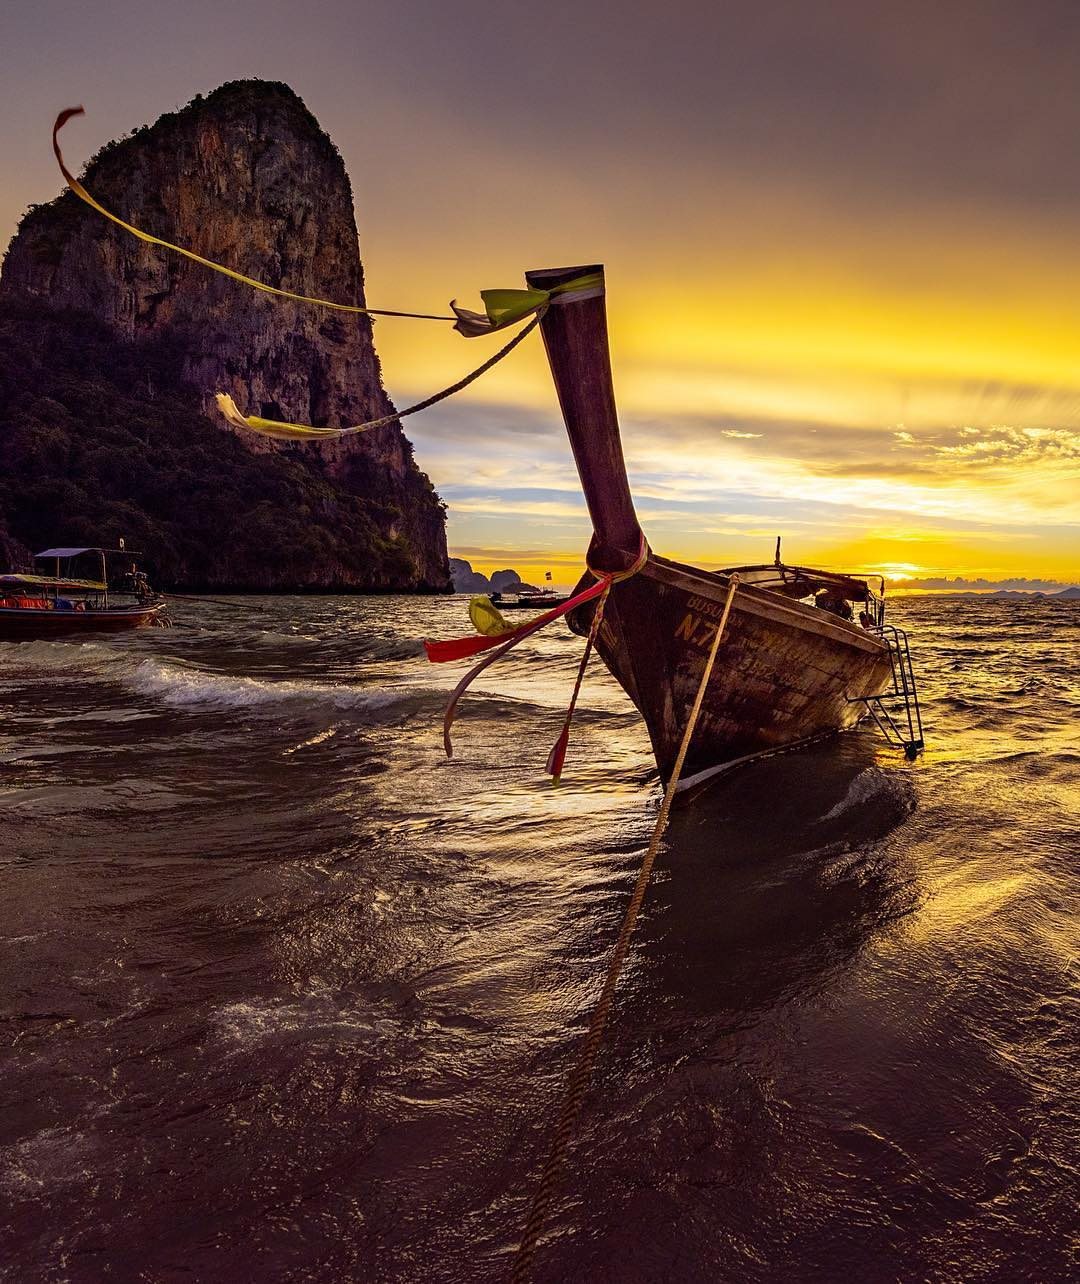 Longtailboat op Phra Nang Beach tijdens de zonsondergang